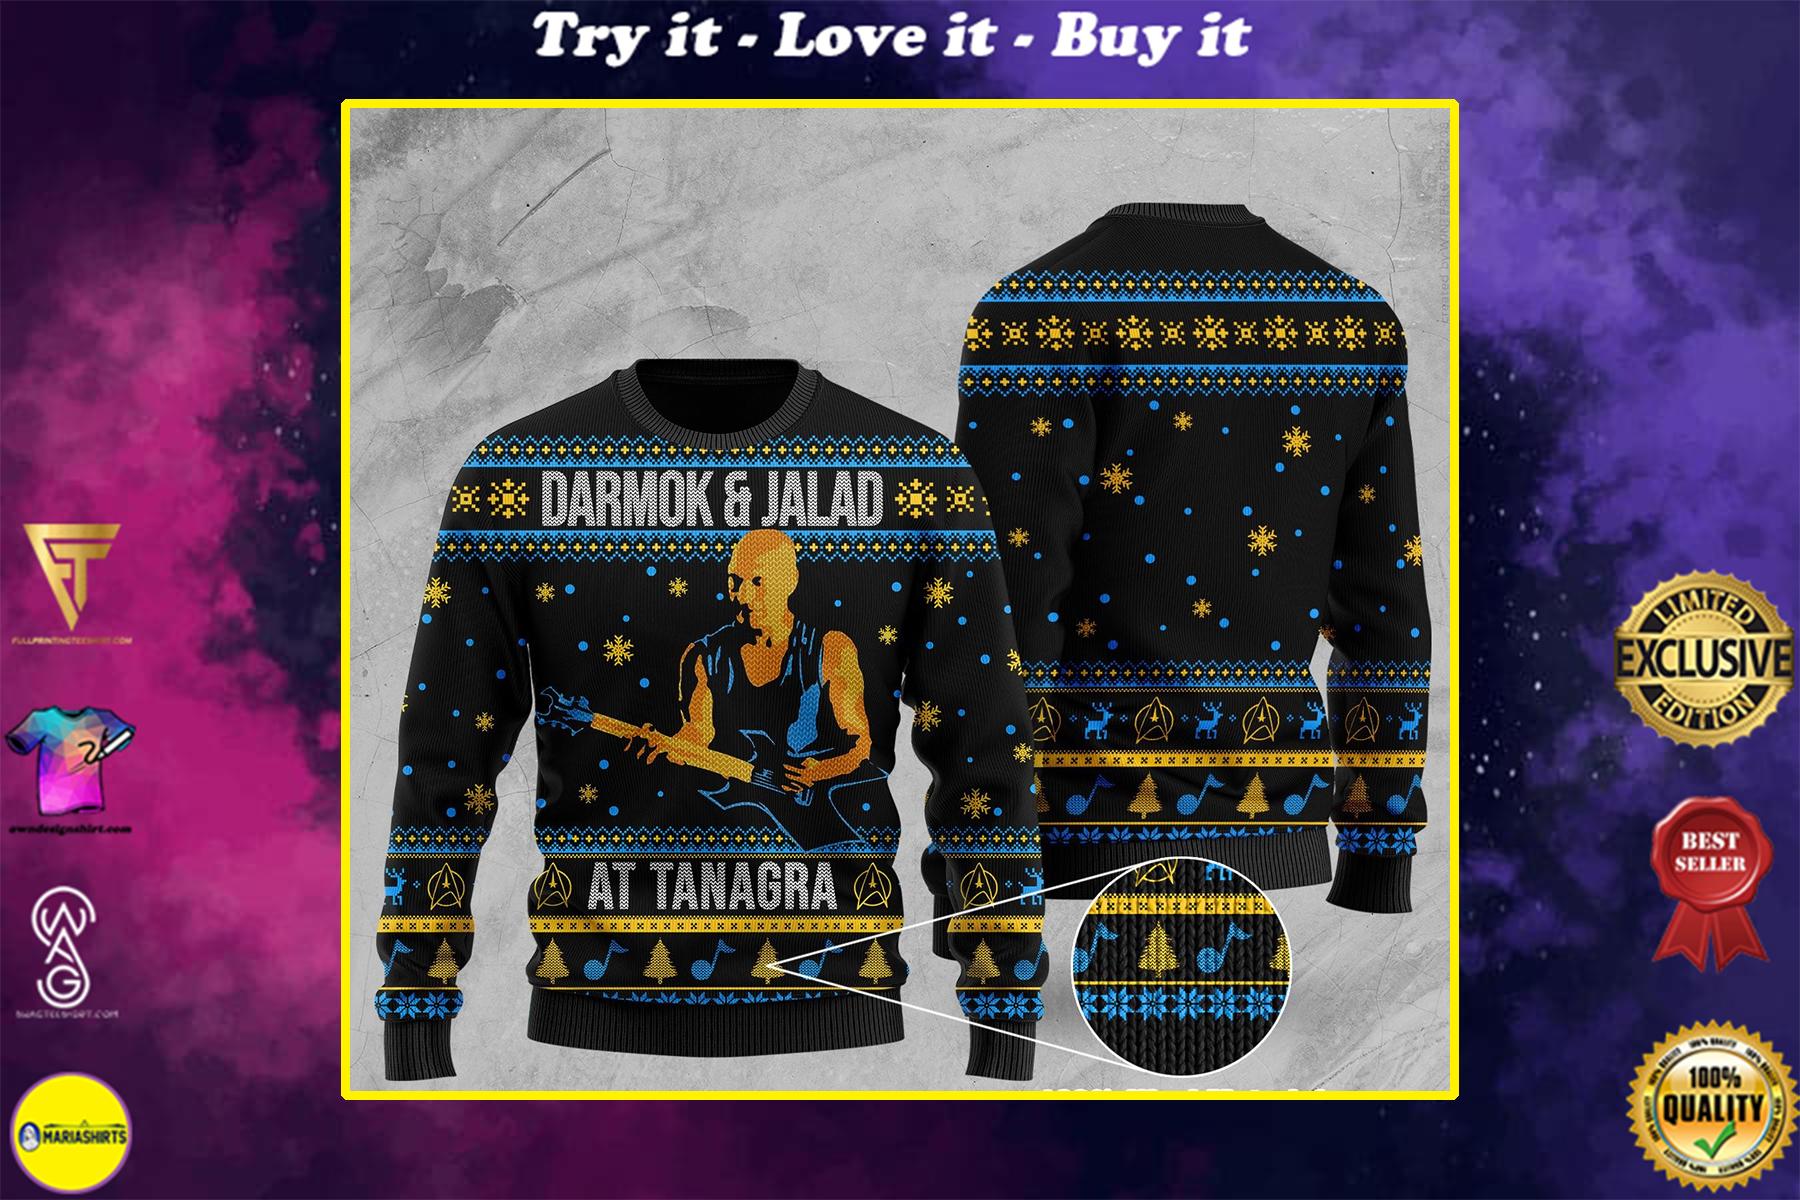 darmok and jalad at tanagra all over printed ugly christmas sweater